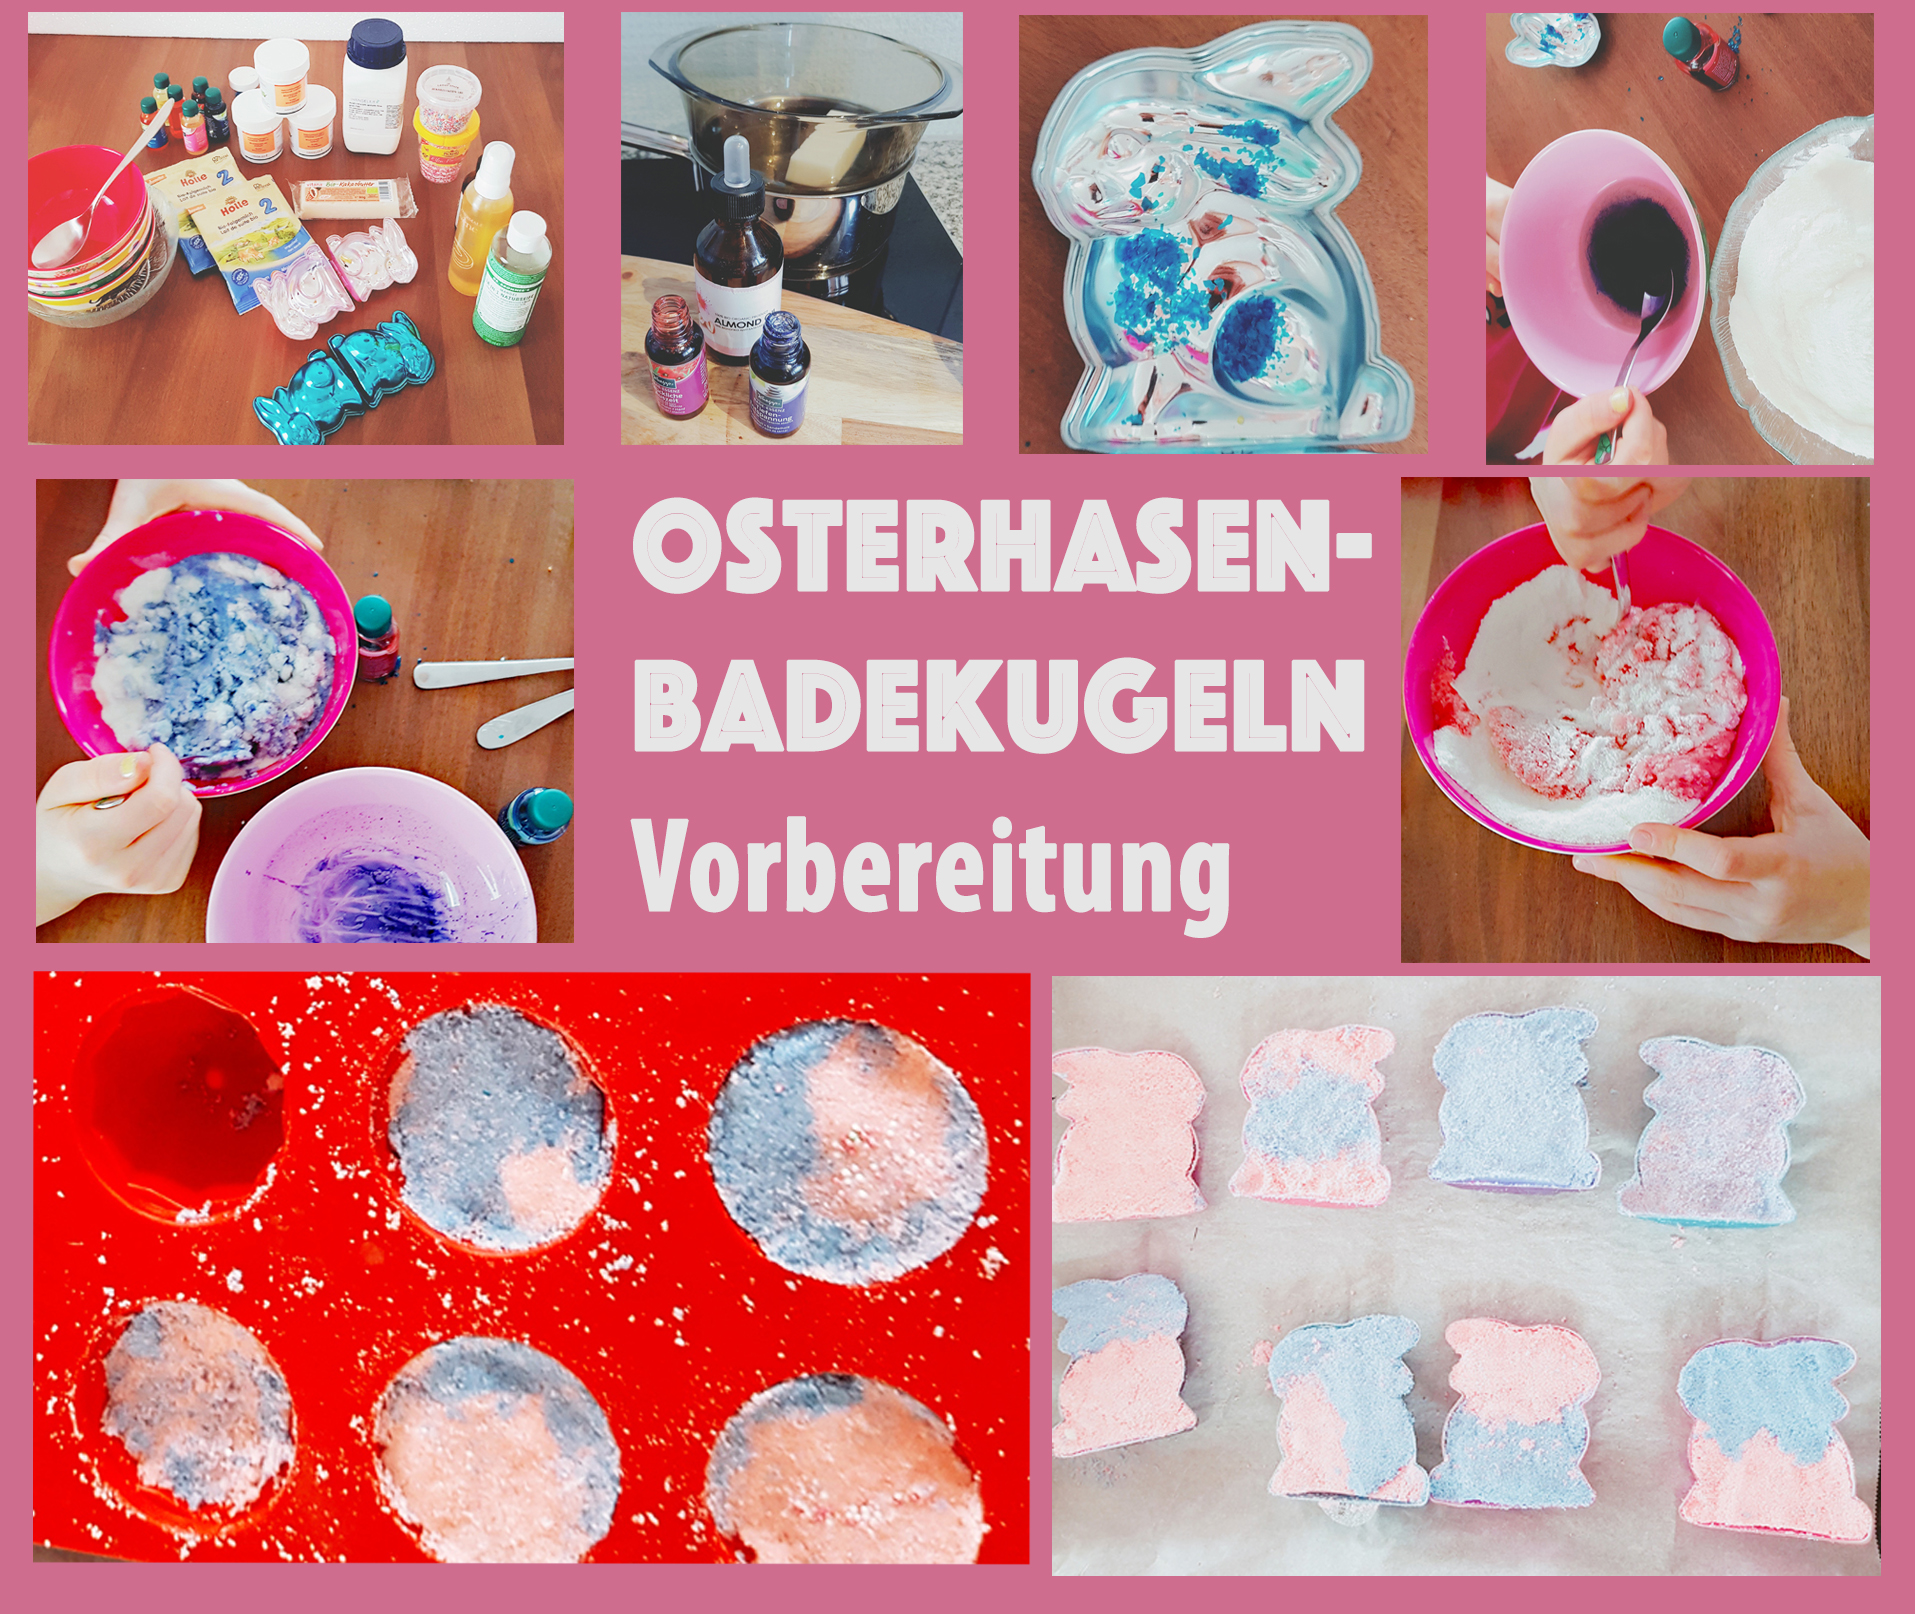 osterhasen_prep_nau